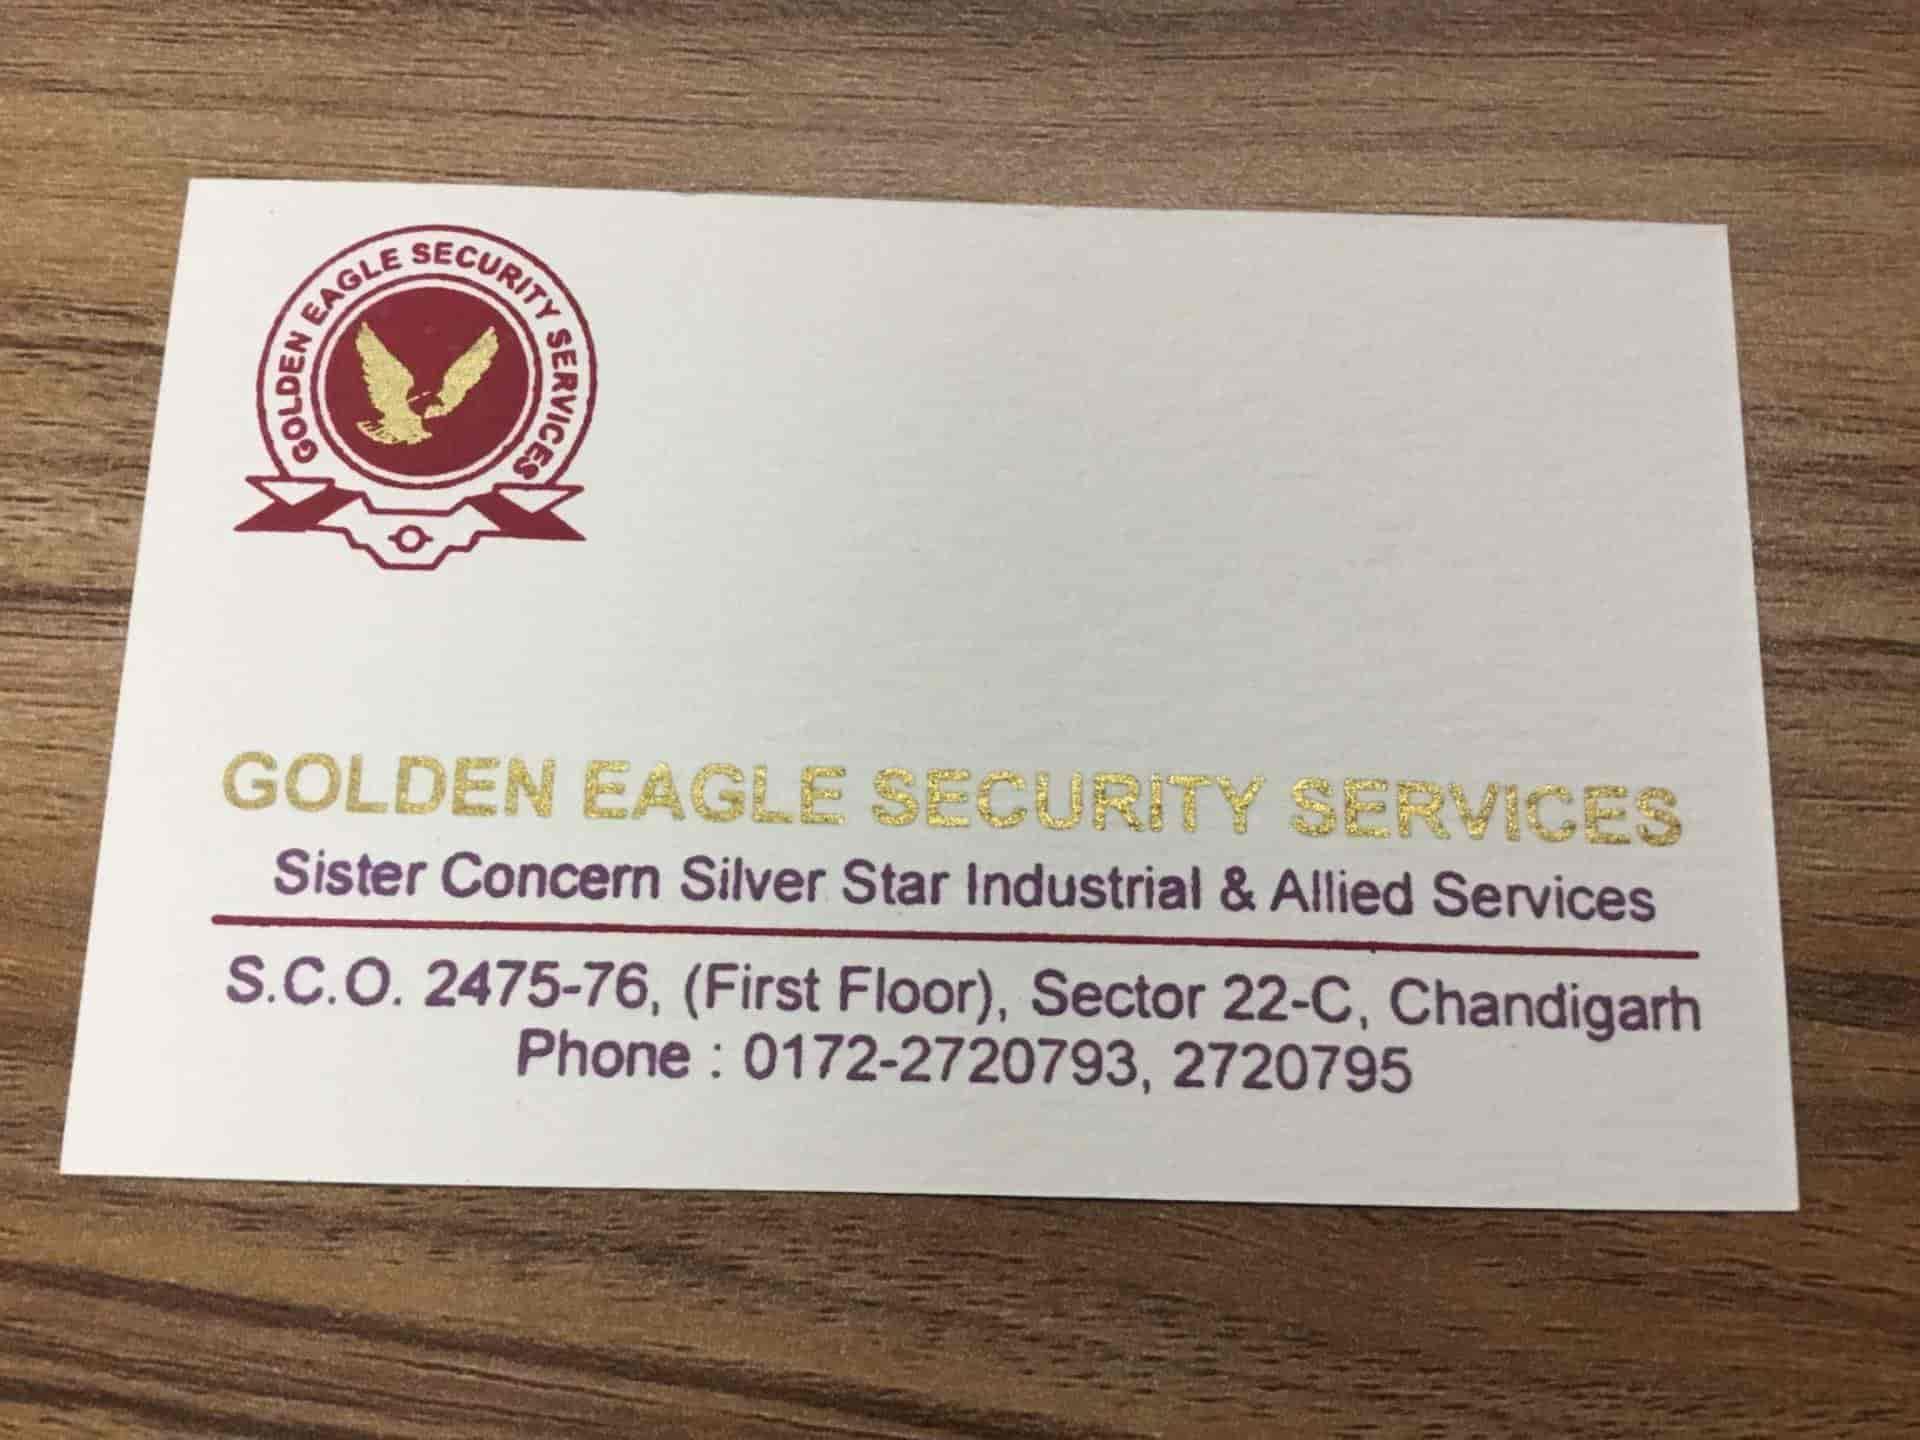 Golden Eagle Security Service Jaffna Opening Times Tel 94 212 225 102